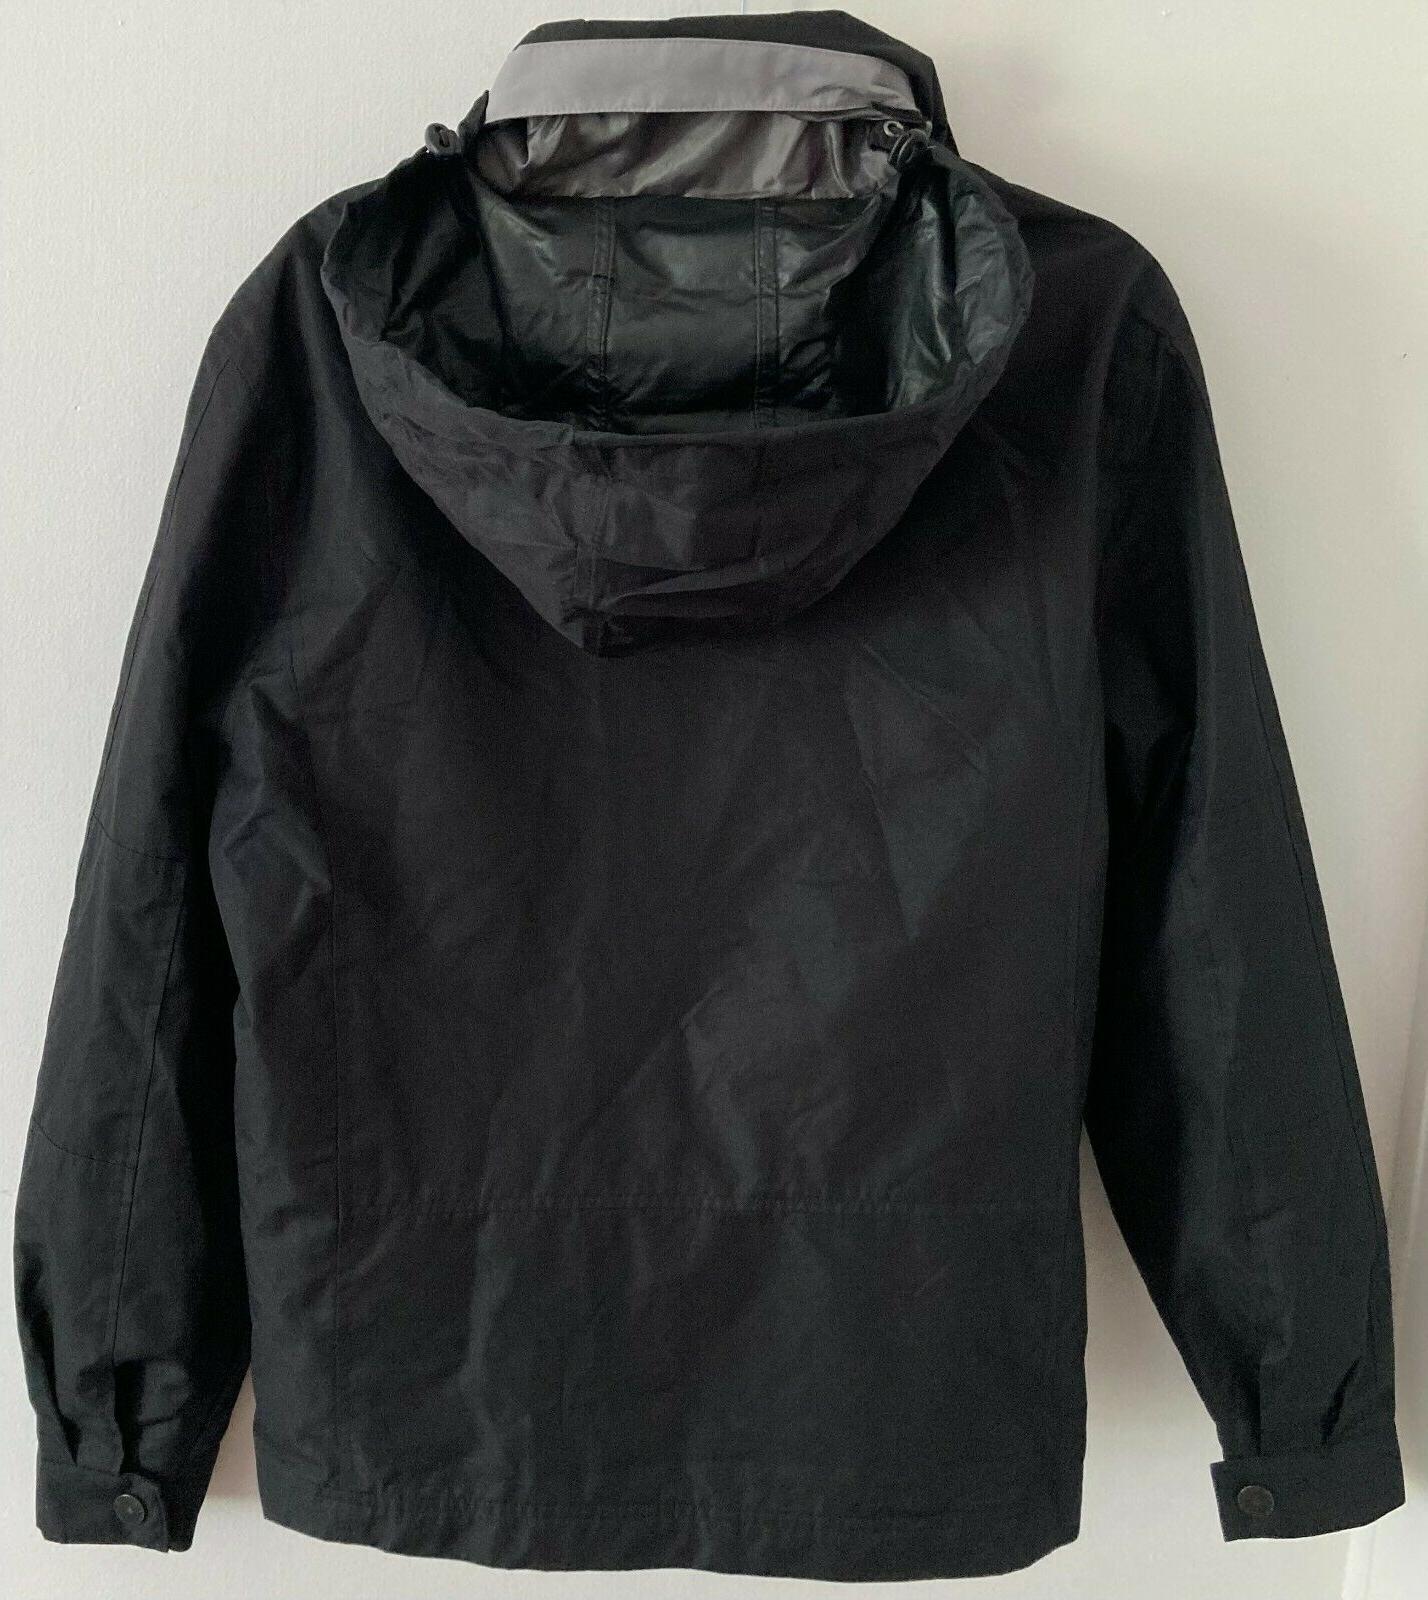 London Fog Bomber Style Jacket Hidden Small